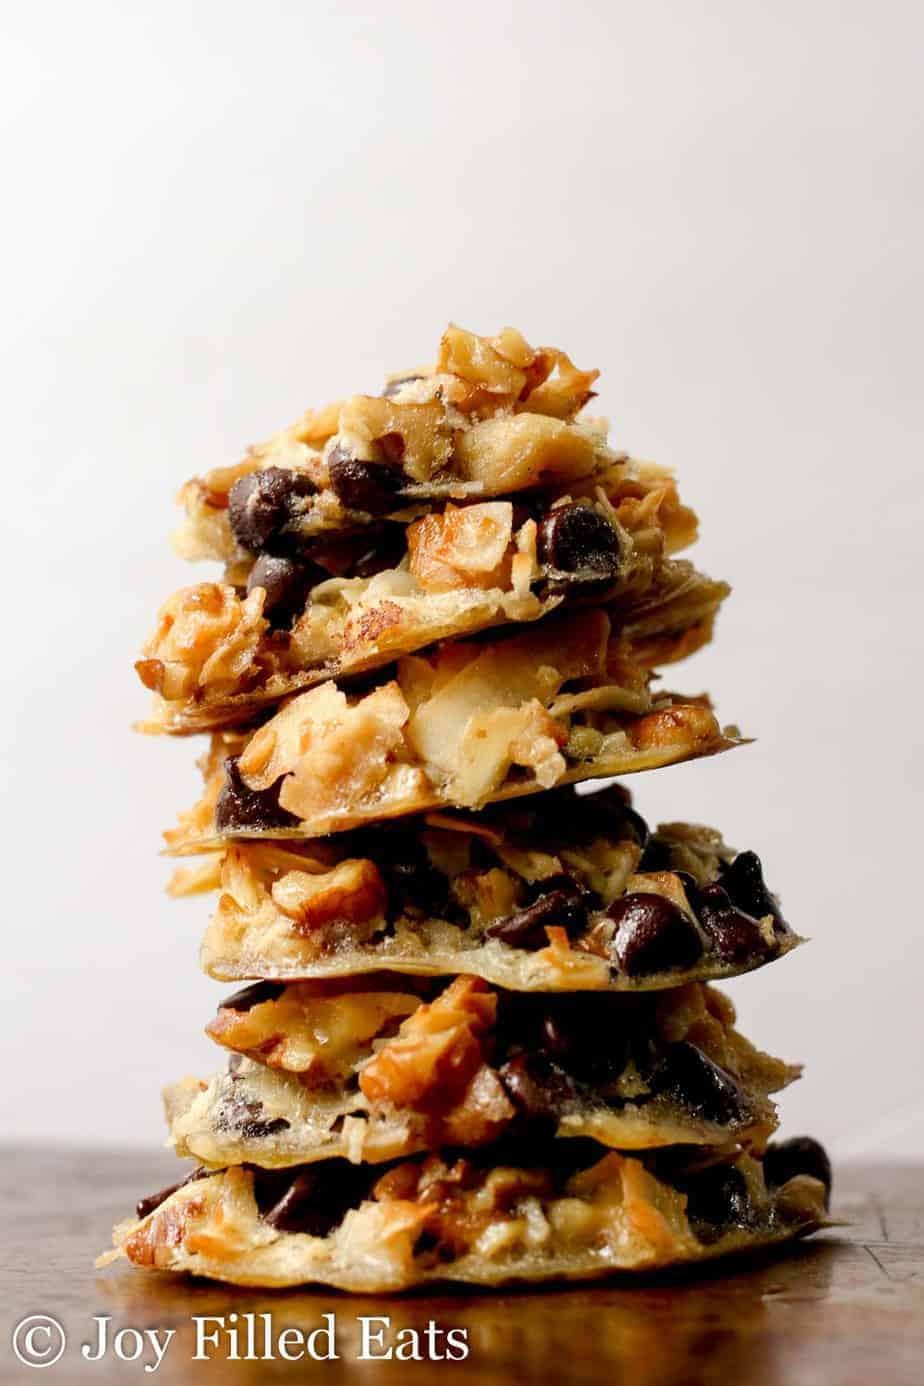 Five Minute Magic Keto Cookies plus more great recipes for keto cookies!